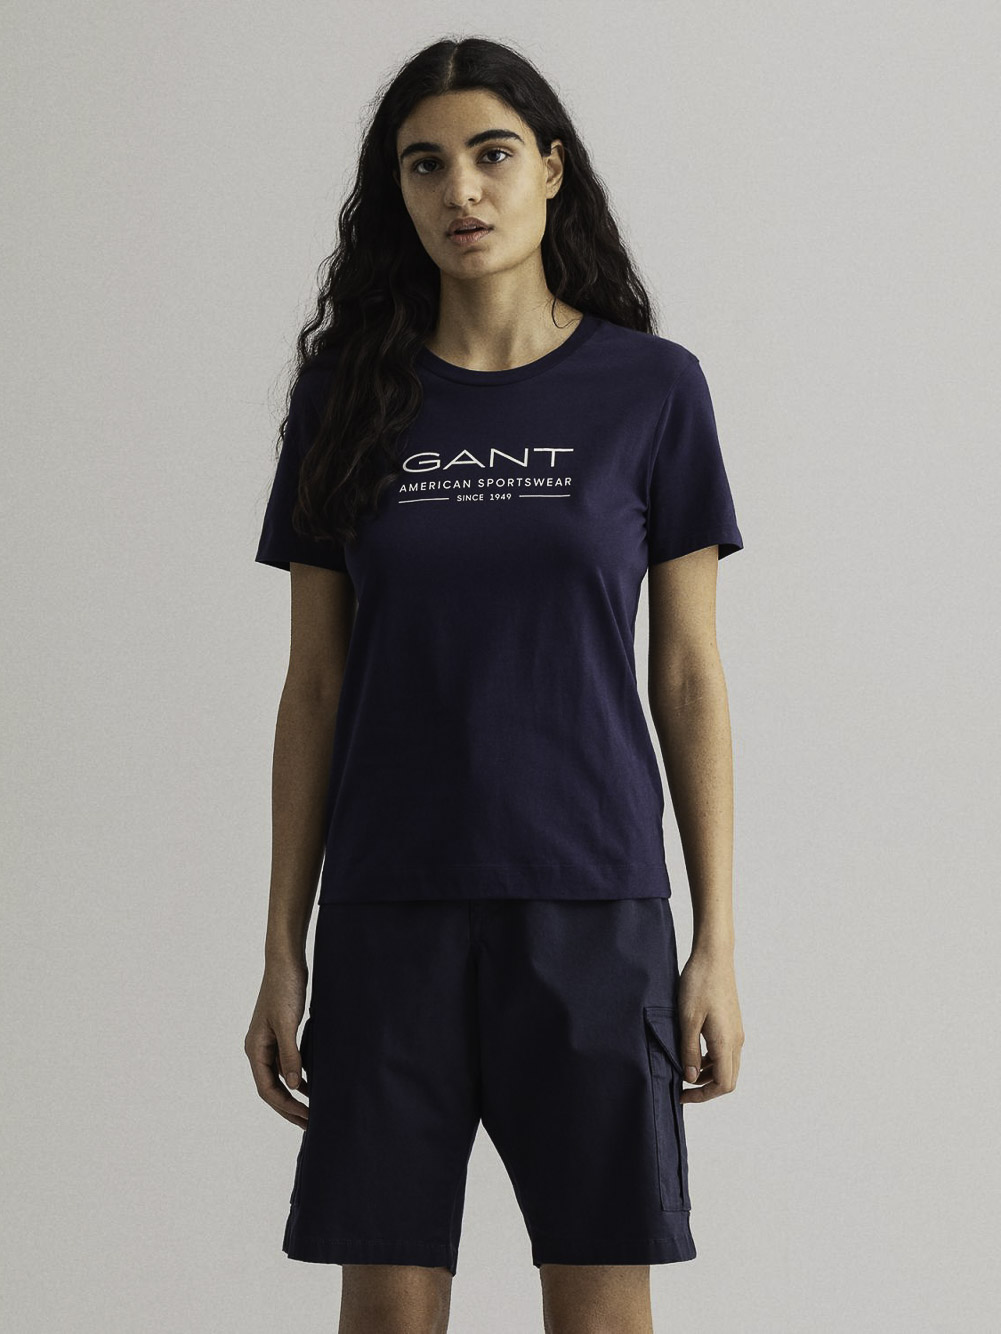 GANT Μπλούζα t-shirt 3GW4200445-409 ΜΠΛΕ